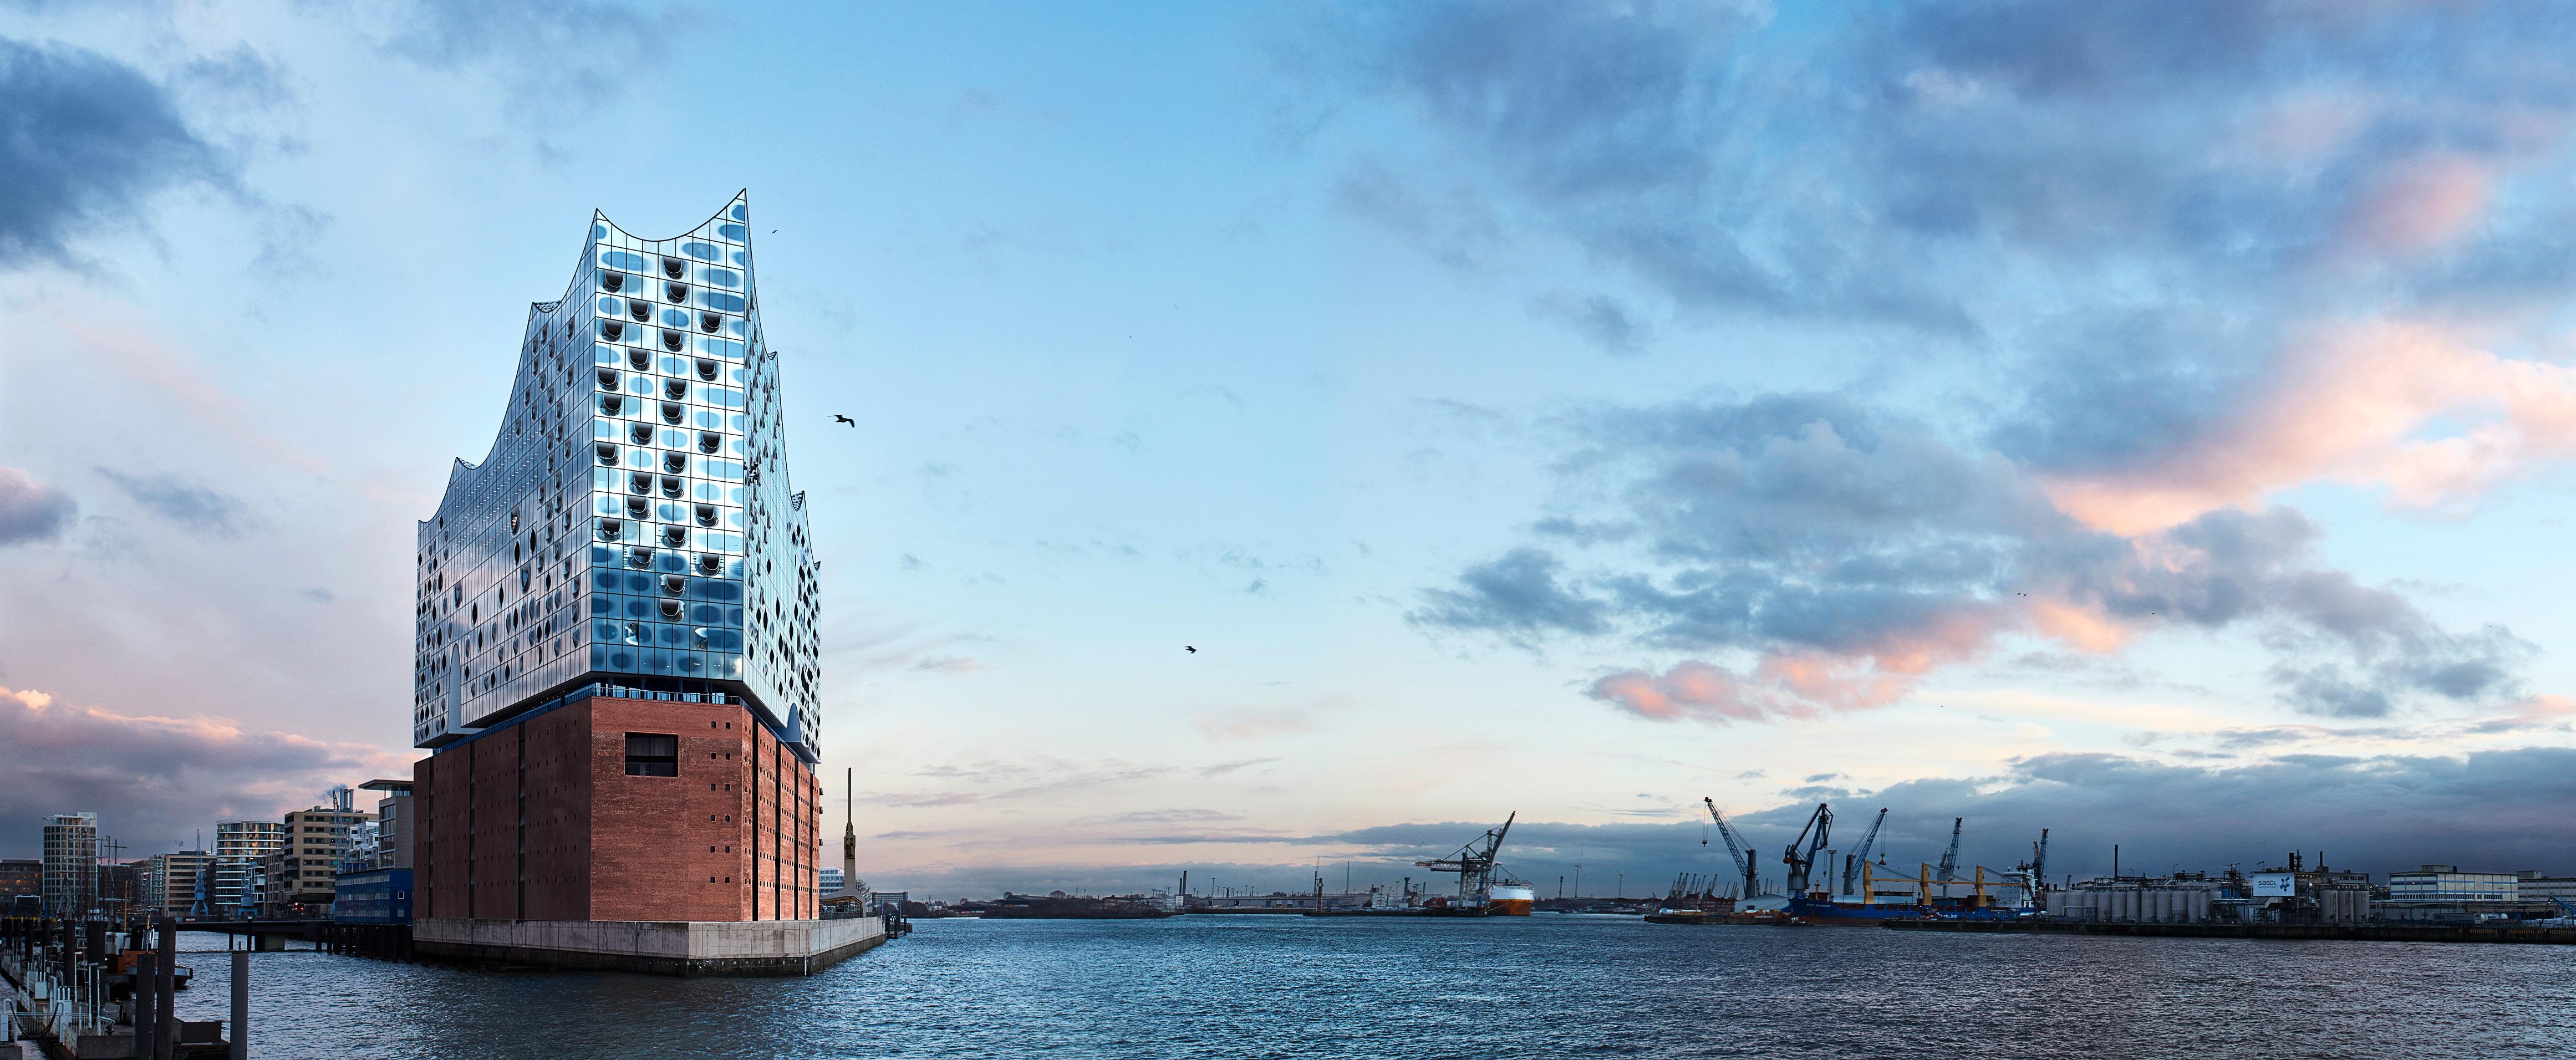 Se estrena hito arquitectónico: la Elbphilharmonie